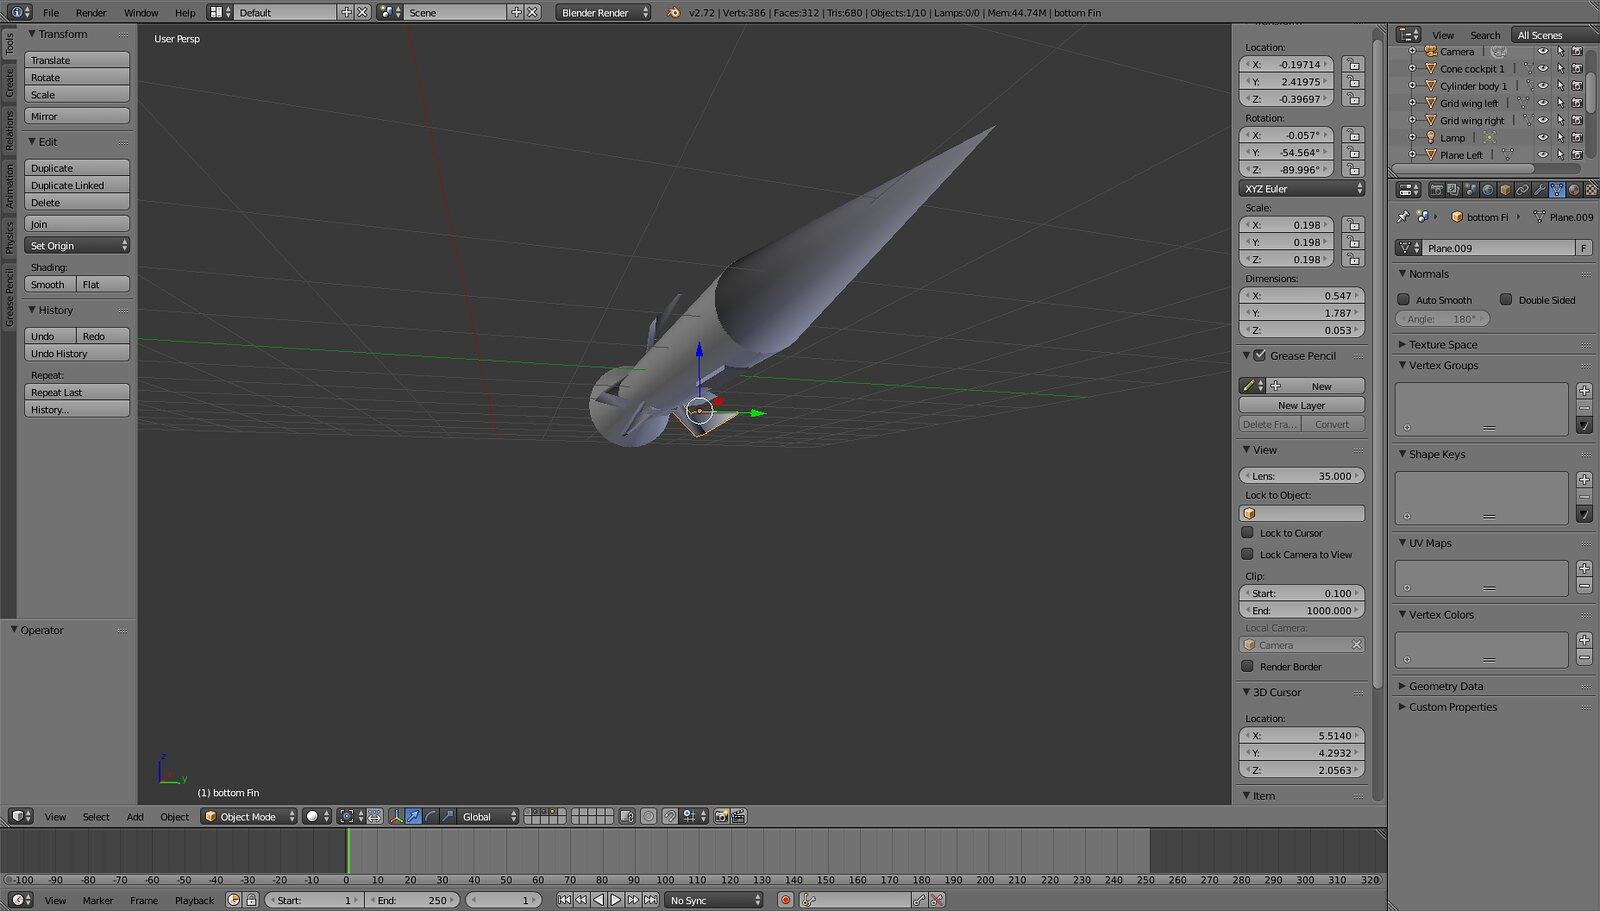 Kiv 1 everything but wings